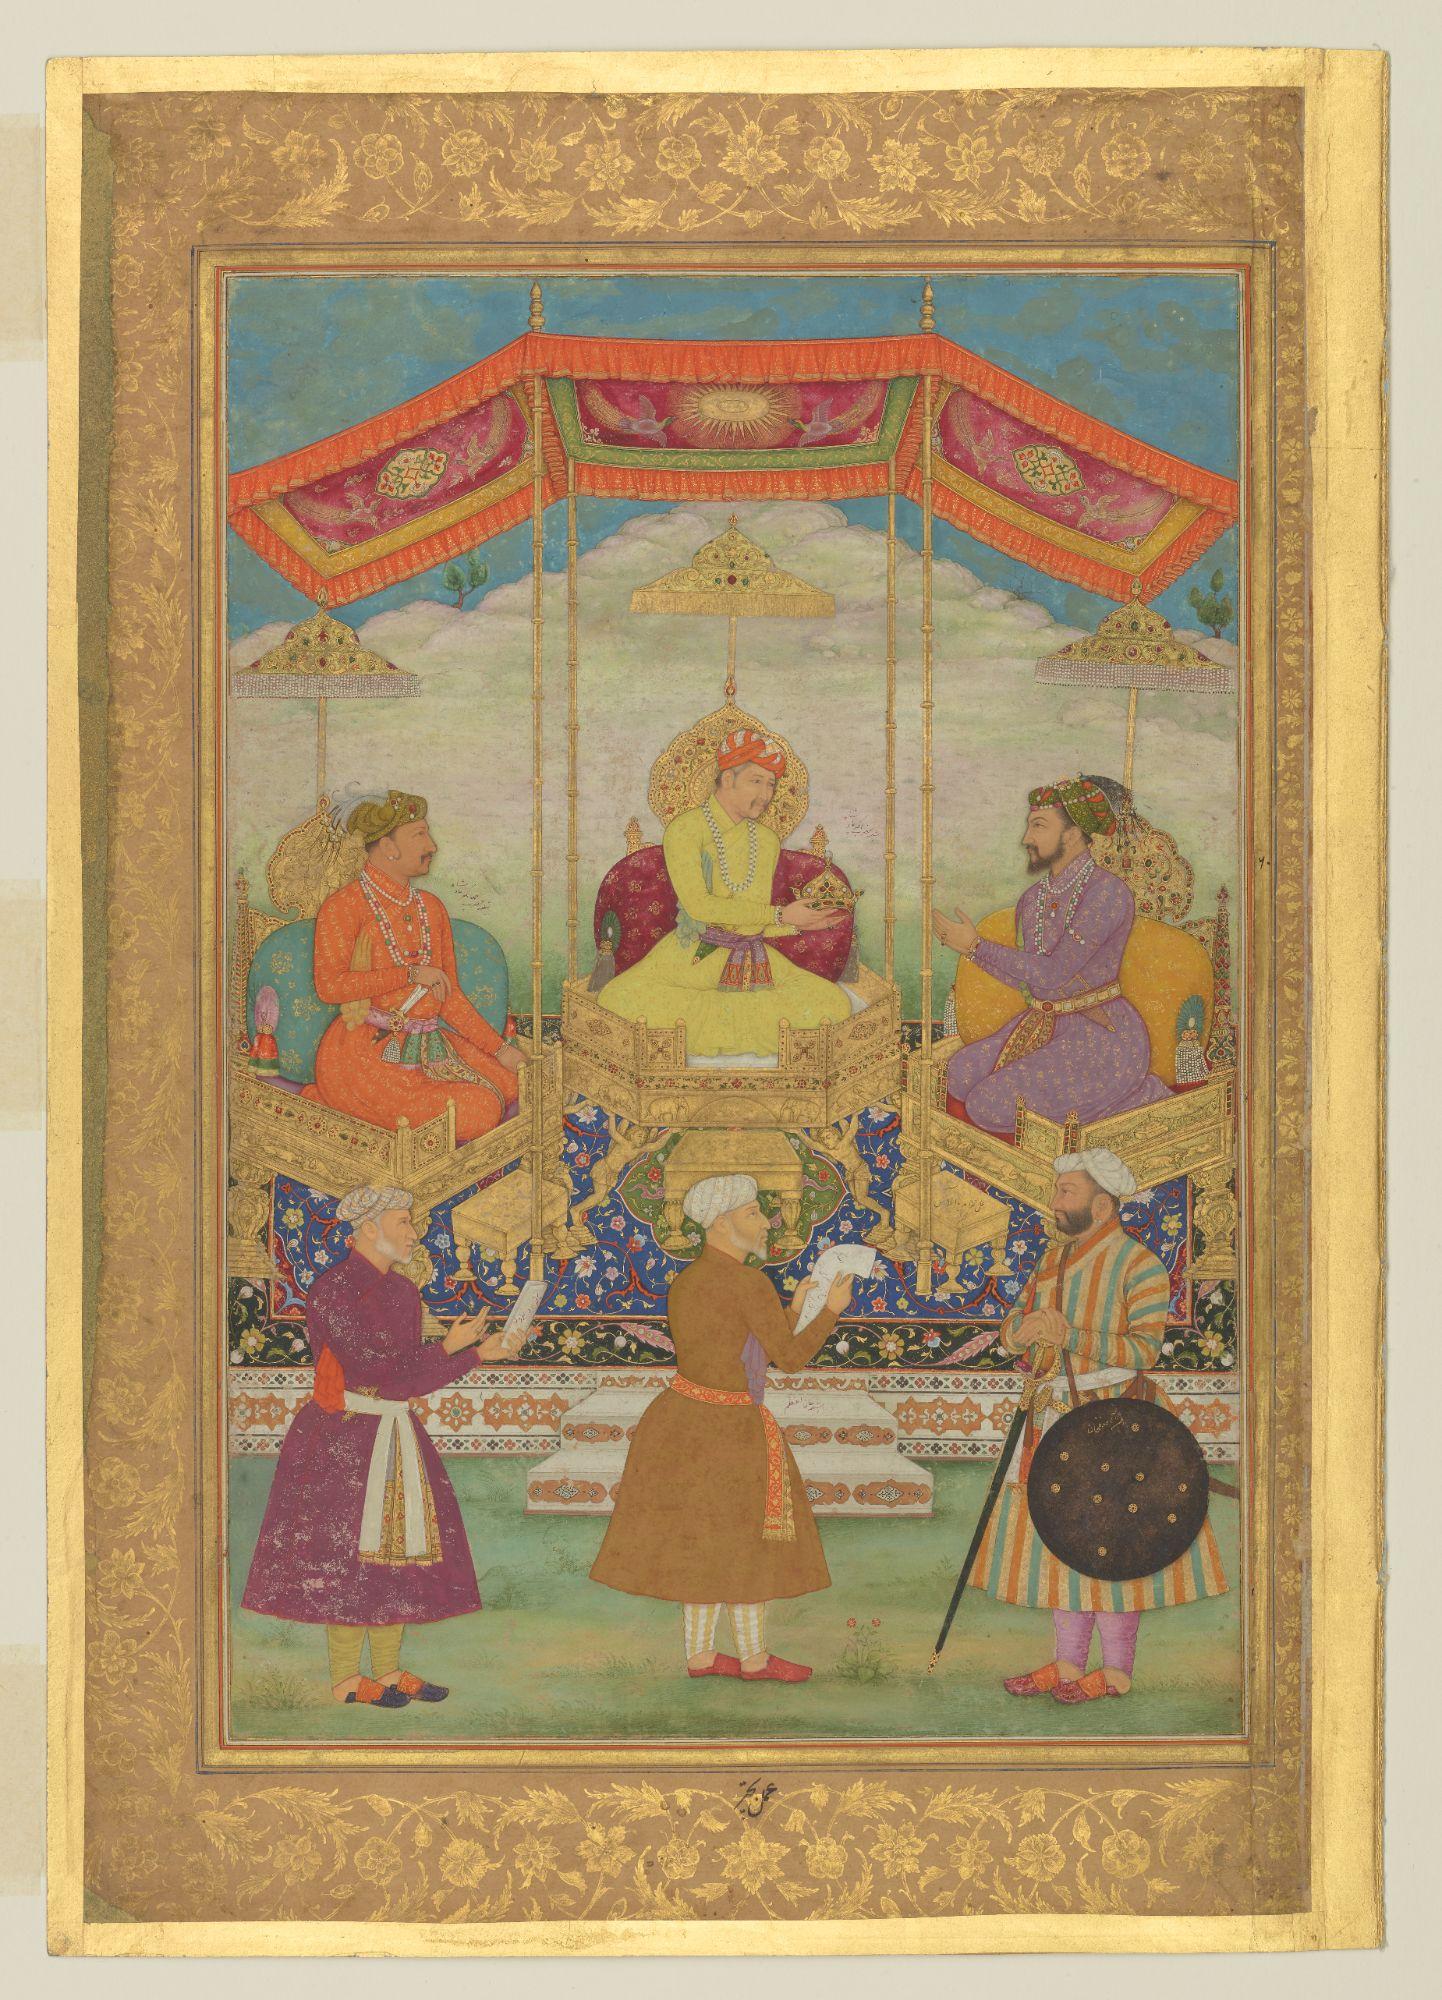 Book of Kings: Early Mughal portraits in Muraqqa's - Reads